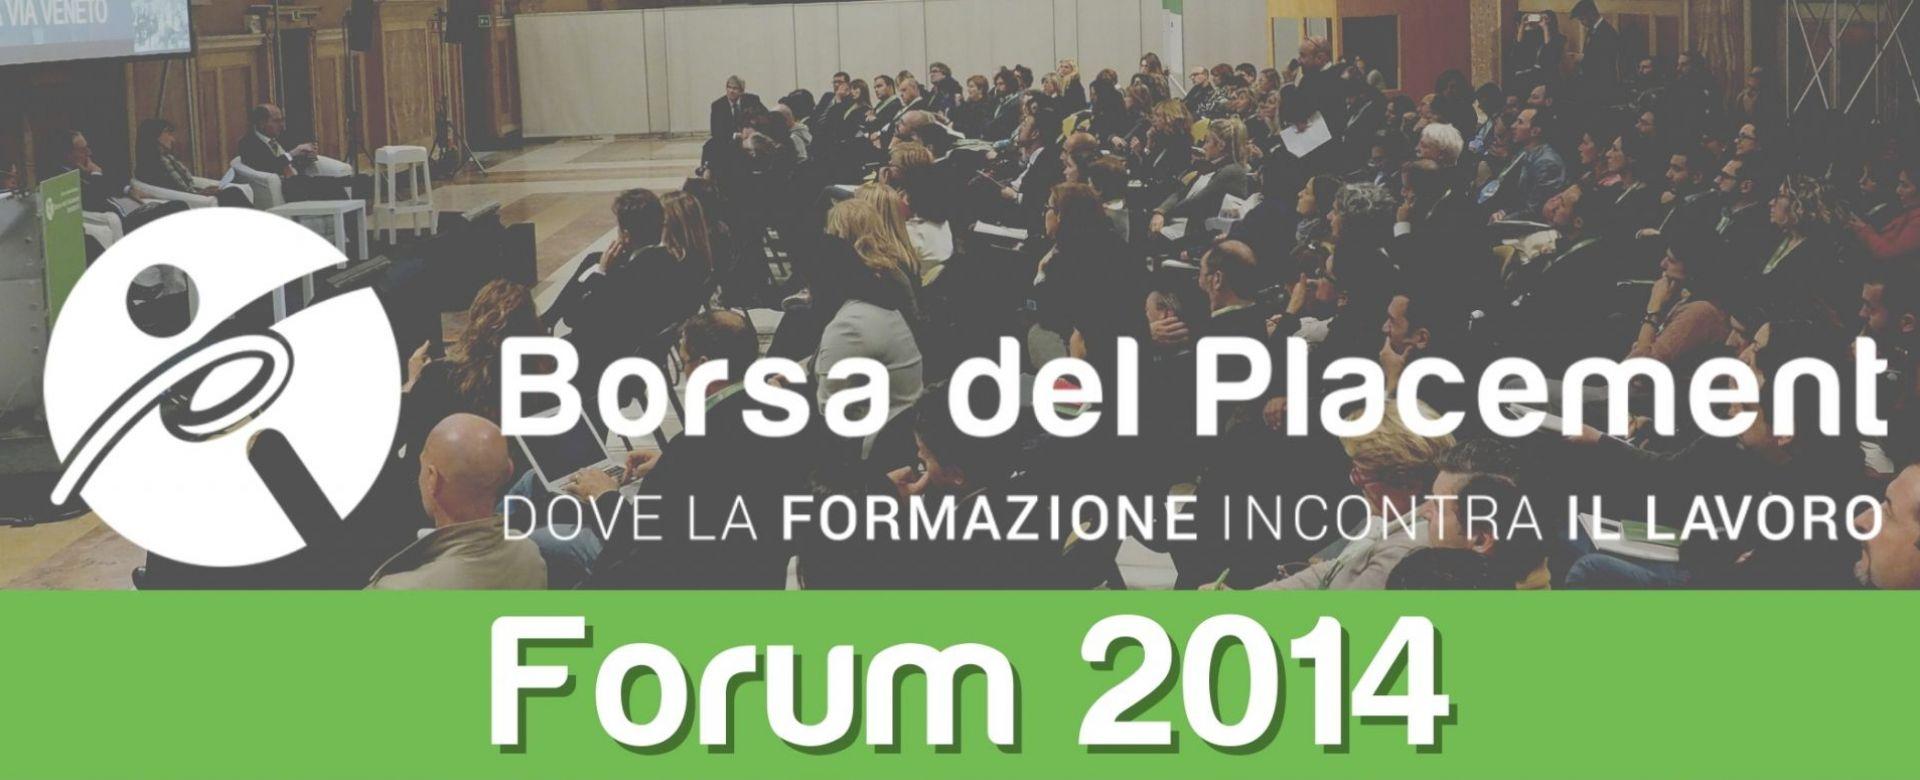 31.10.2014 - Borsa del Placement   VIII Forum